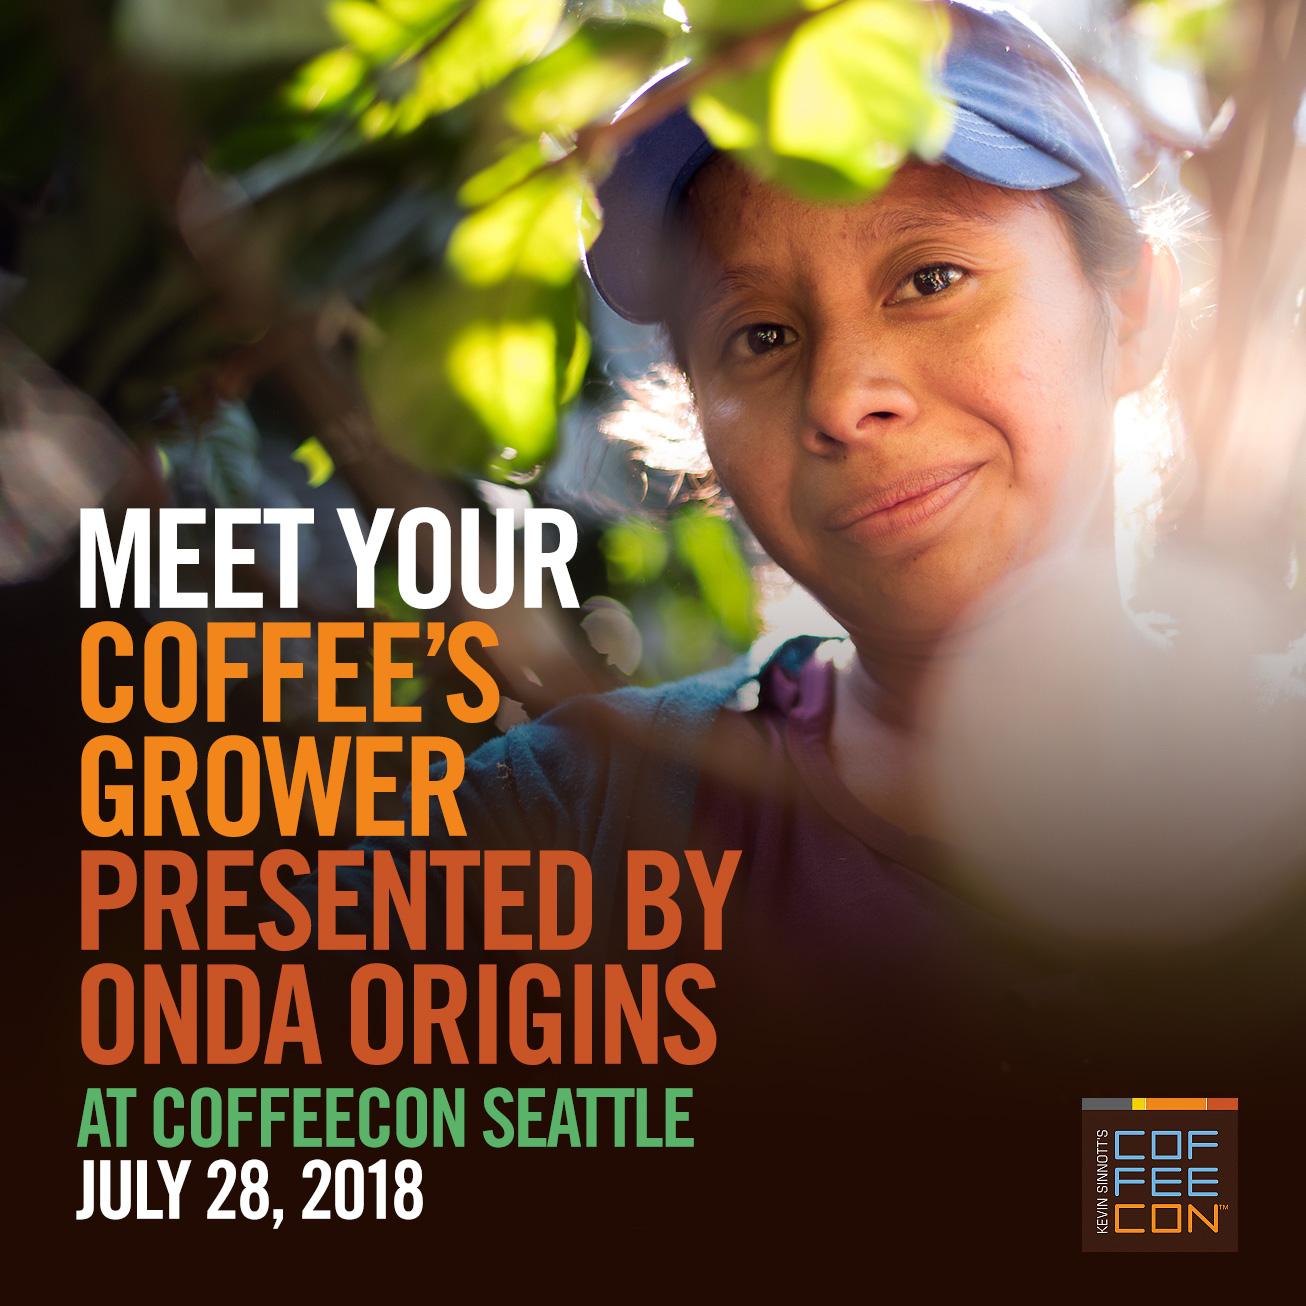 Meet Your Coffee's Grower